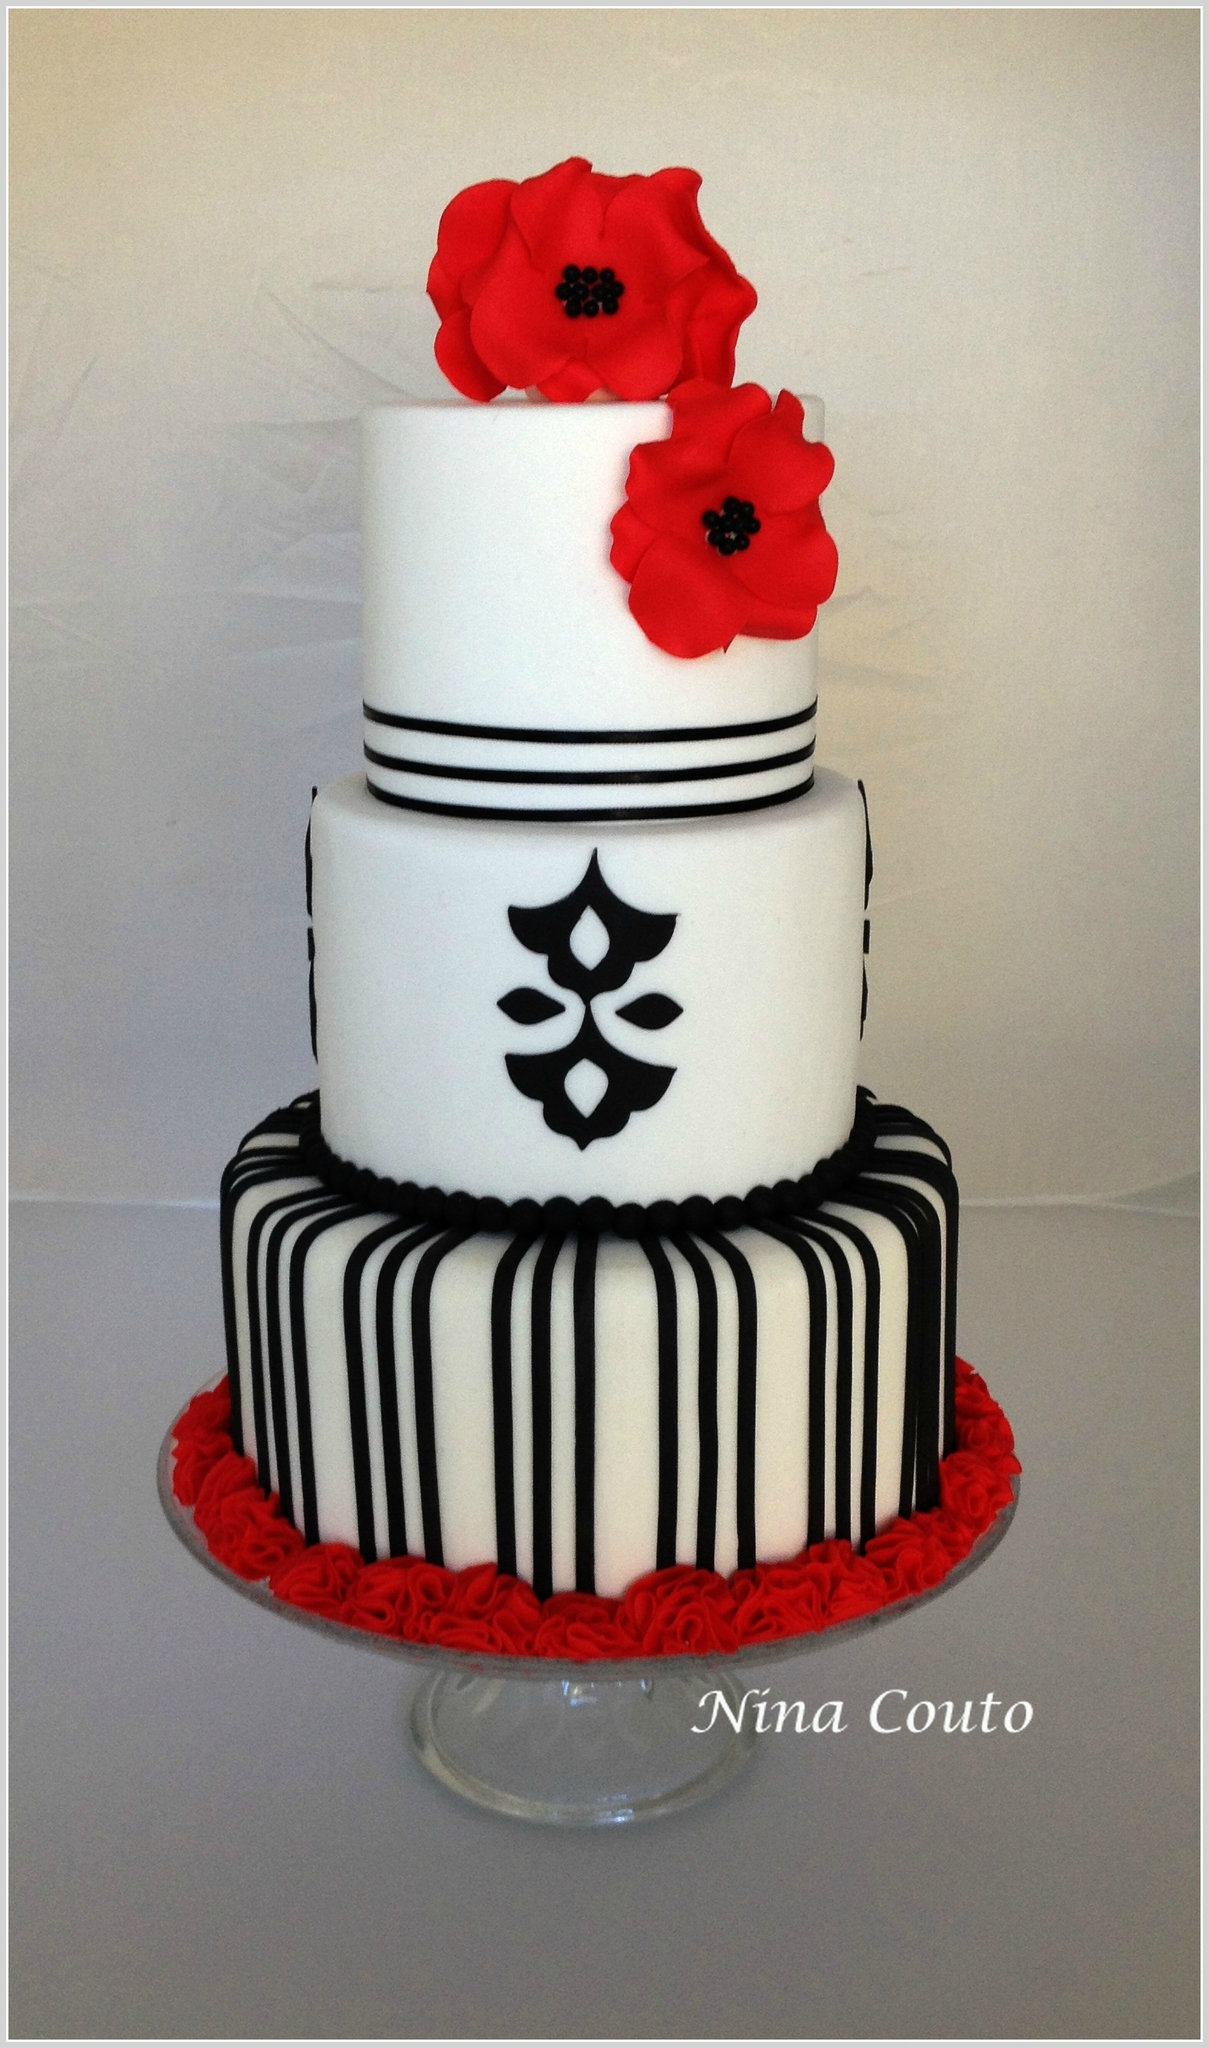 Wedding cake nina couto noir et rouge